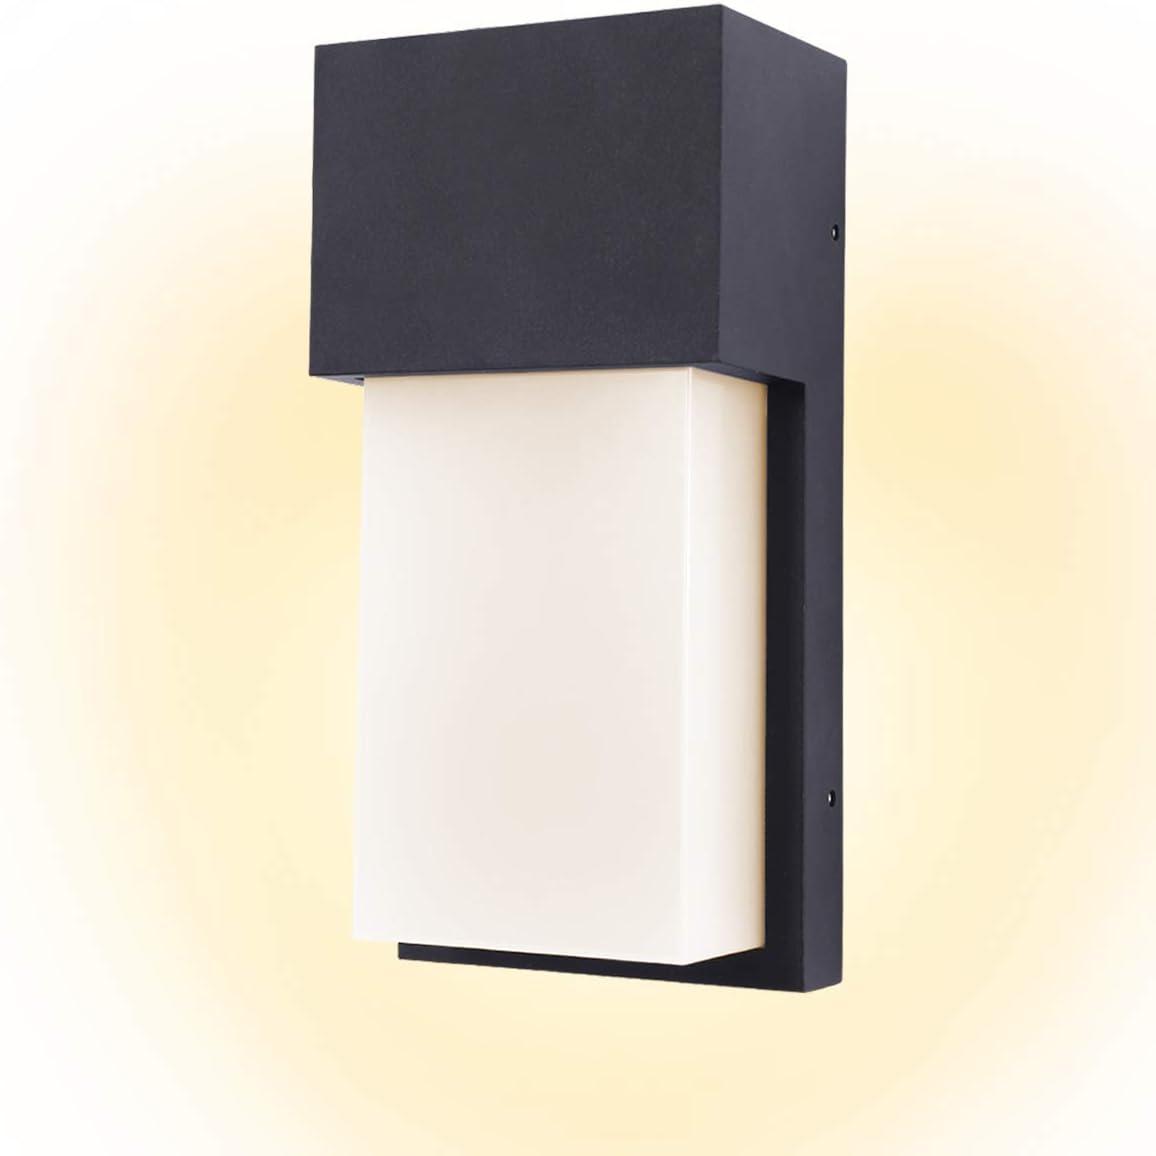 Kernorv Led Wall Sconce Modern Wall Sconce 10w Warm White Waterproof Outdoor Wall Light 4 7 X 9 7 12w Amazon Com